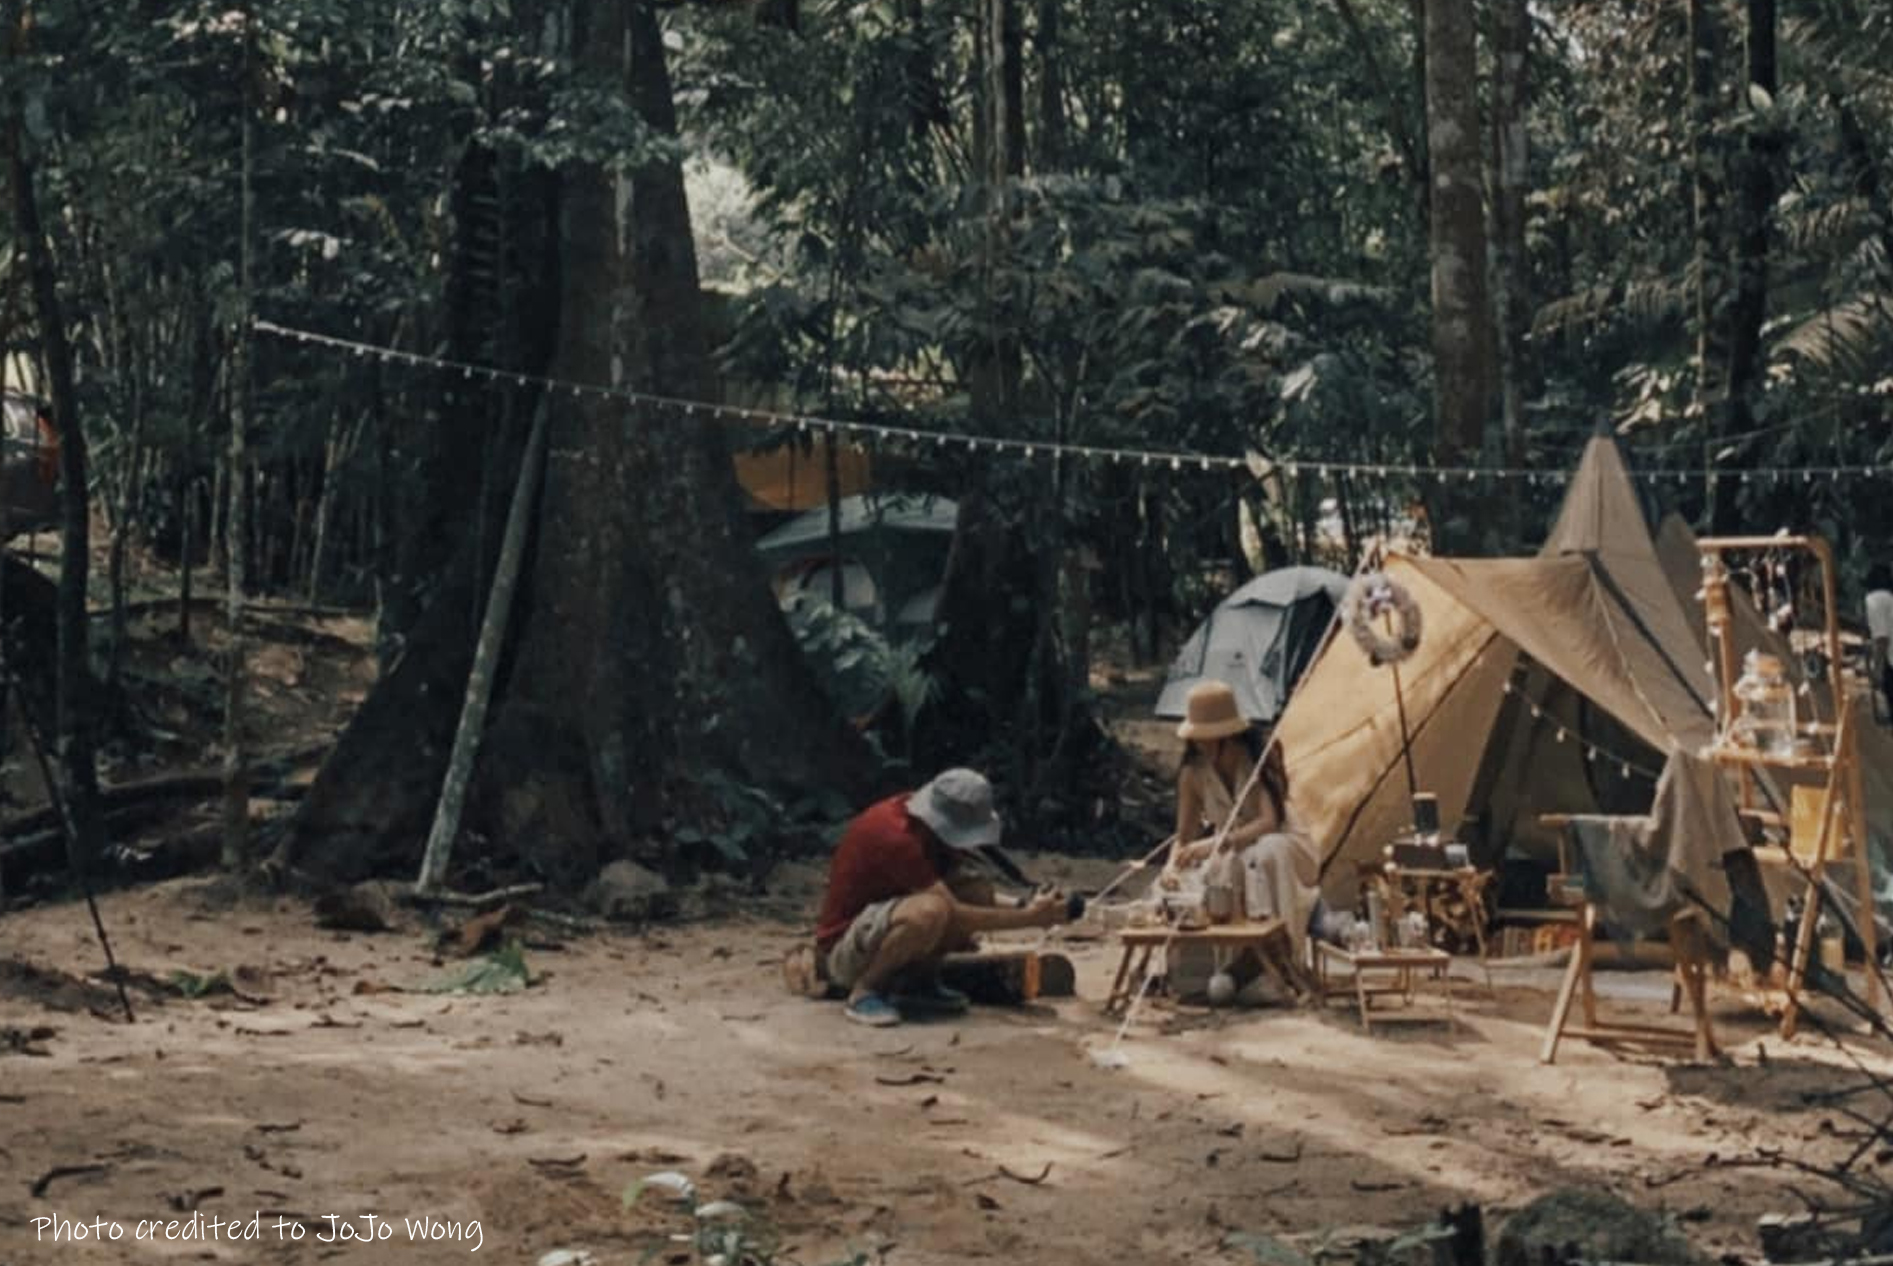 Resort_Taman_Rimba_Komanwel_Rawang_campsite_malaysia_car_camping_private_event_organizer-16